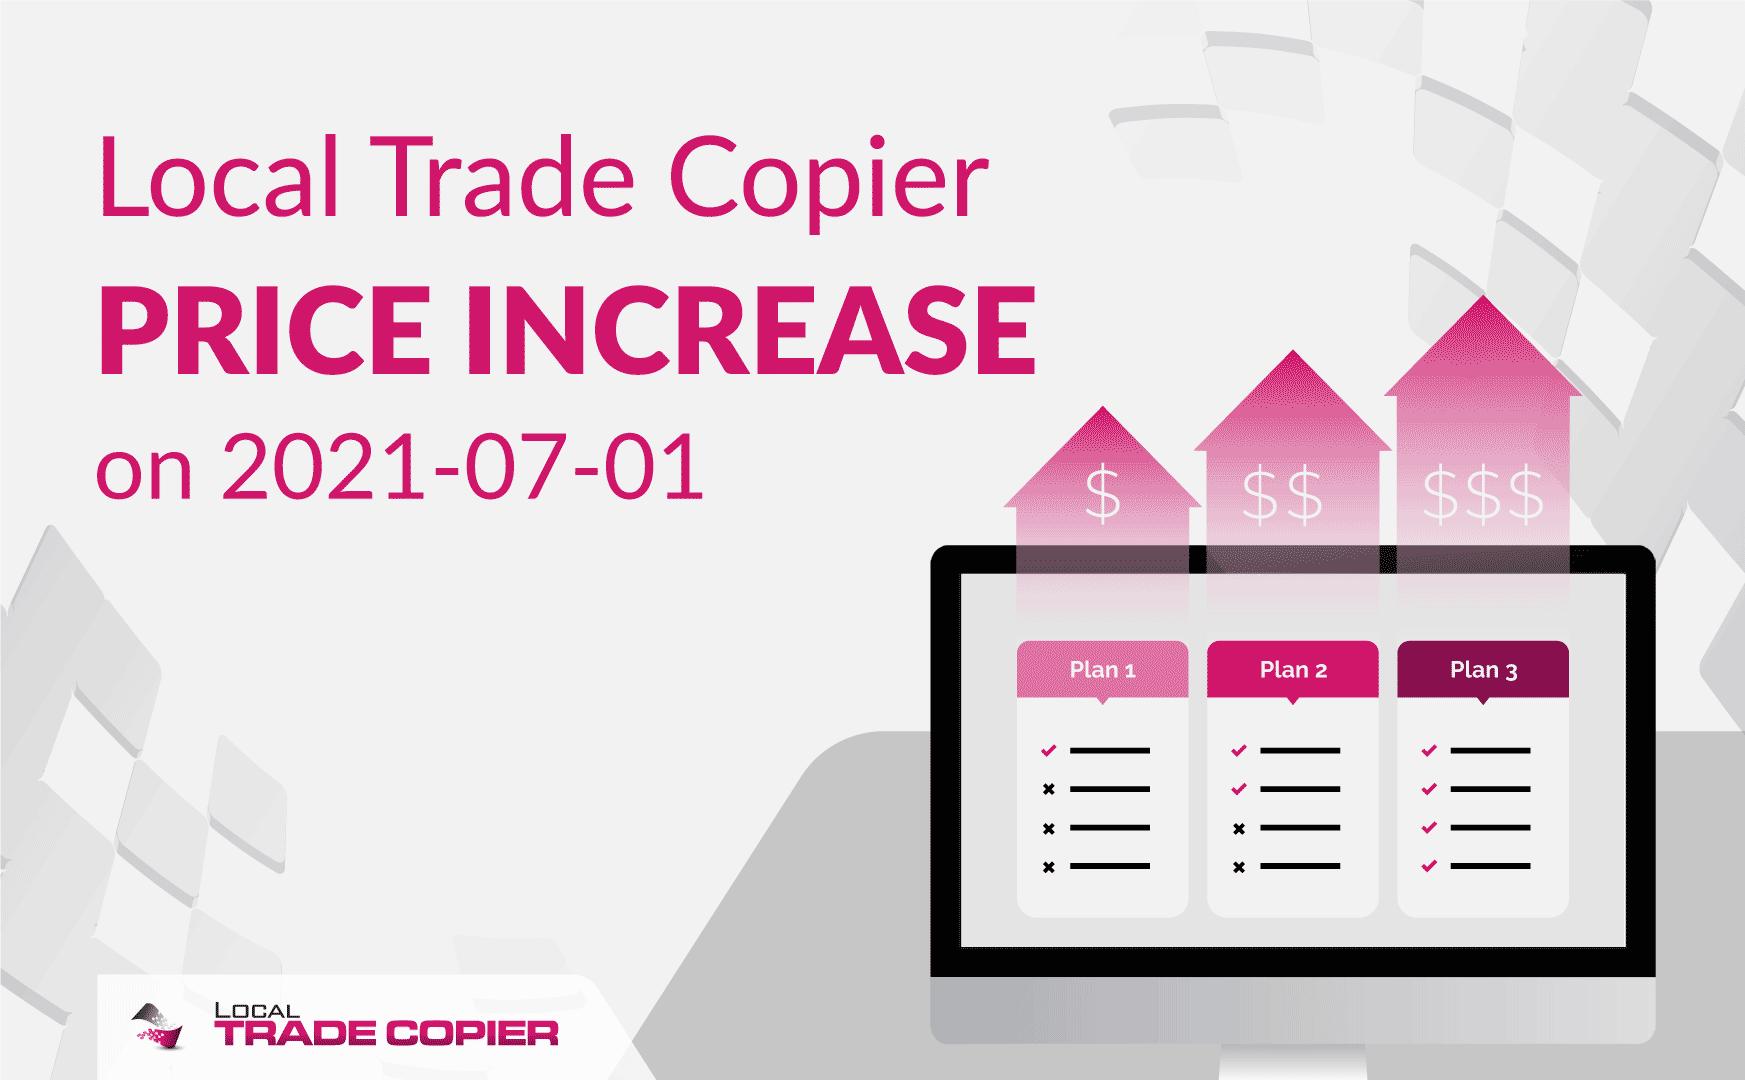 Local Trade Copier price increase on 2021-07-01